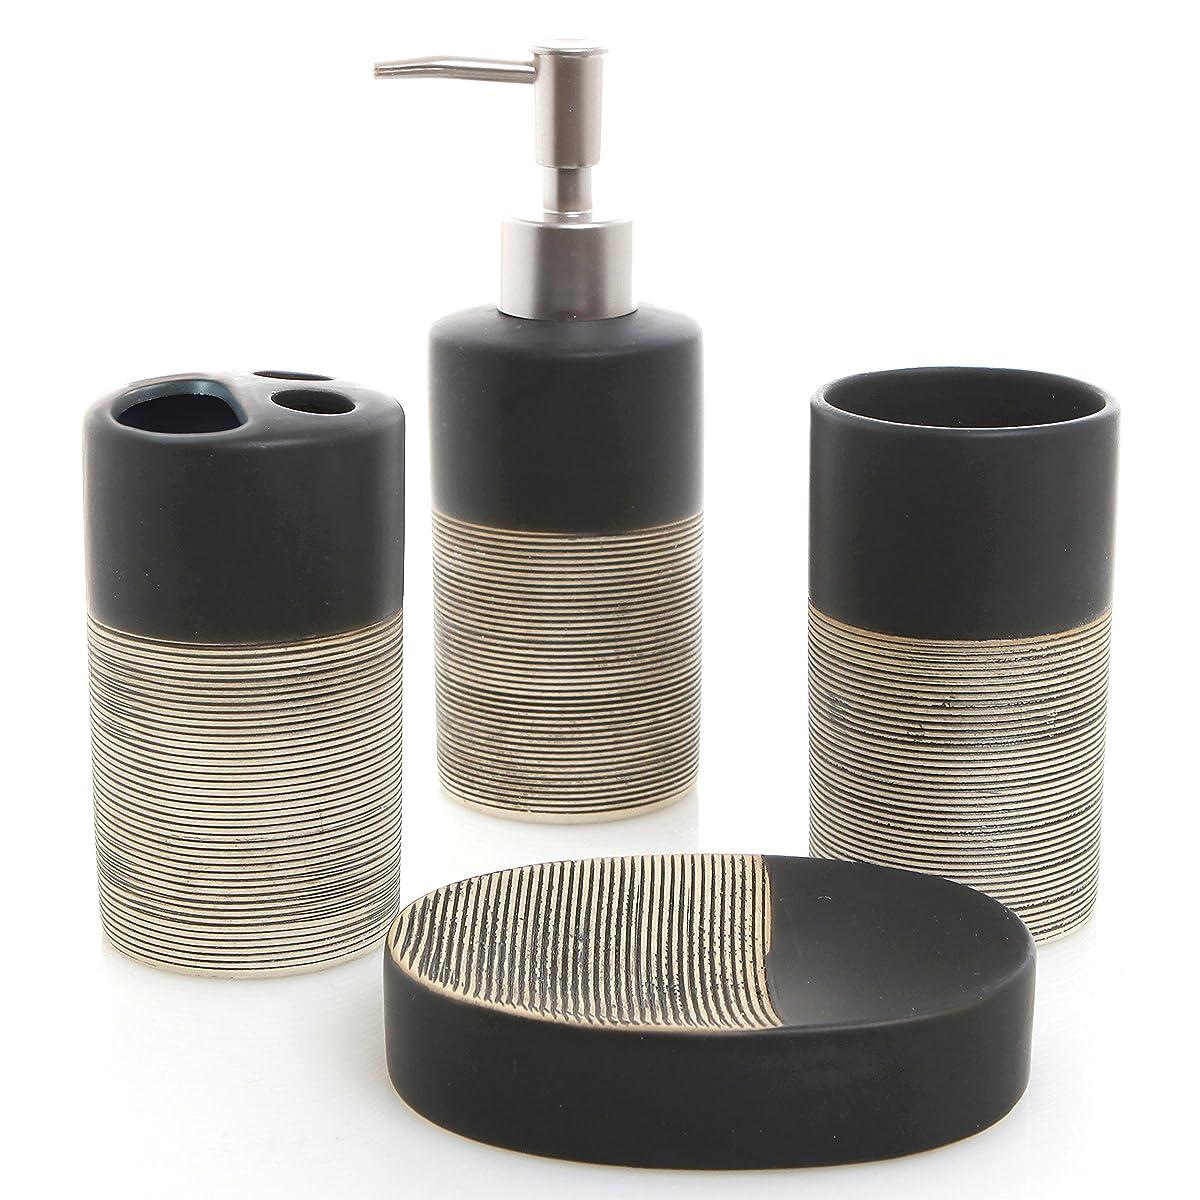 Deluxe 4 Piece Black & Beige Ceramic Bathroom Set w/ Soap Dispenser, Toothbrush Holder, Tumbler & Soap Dish